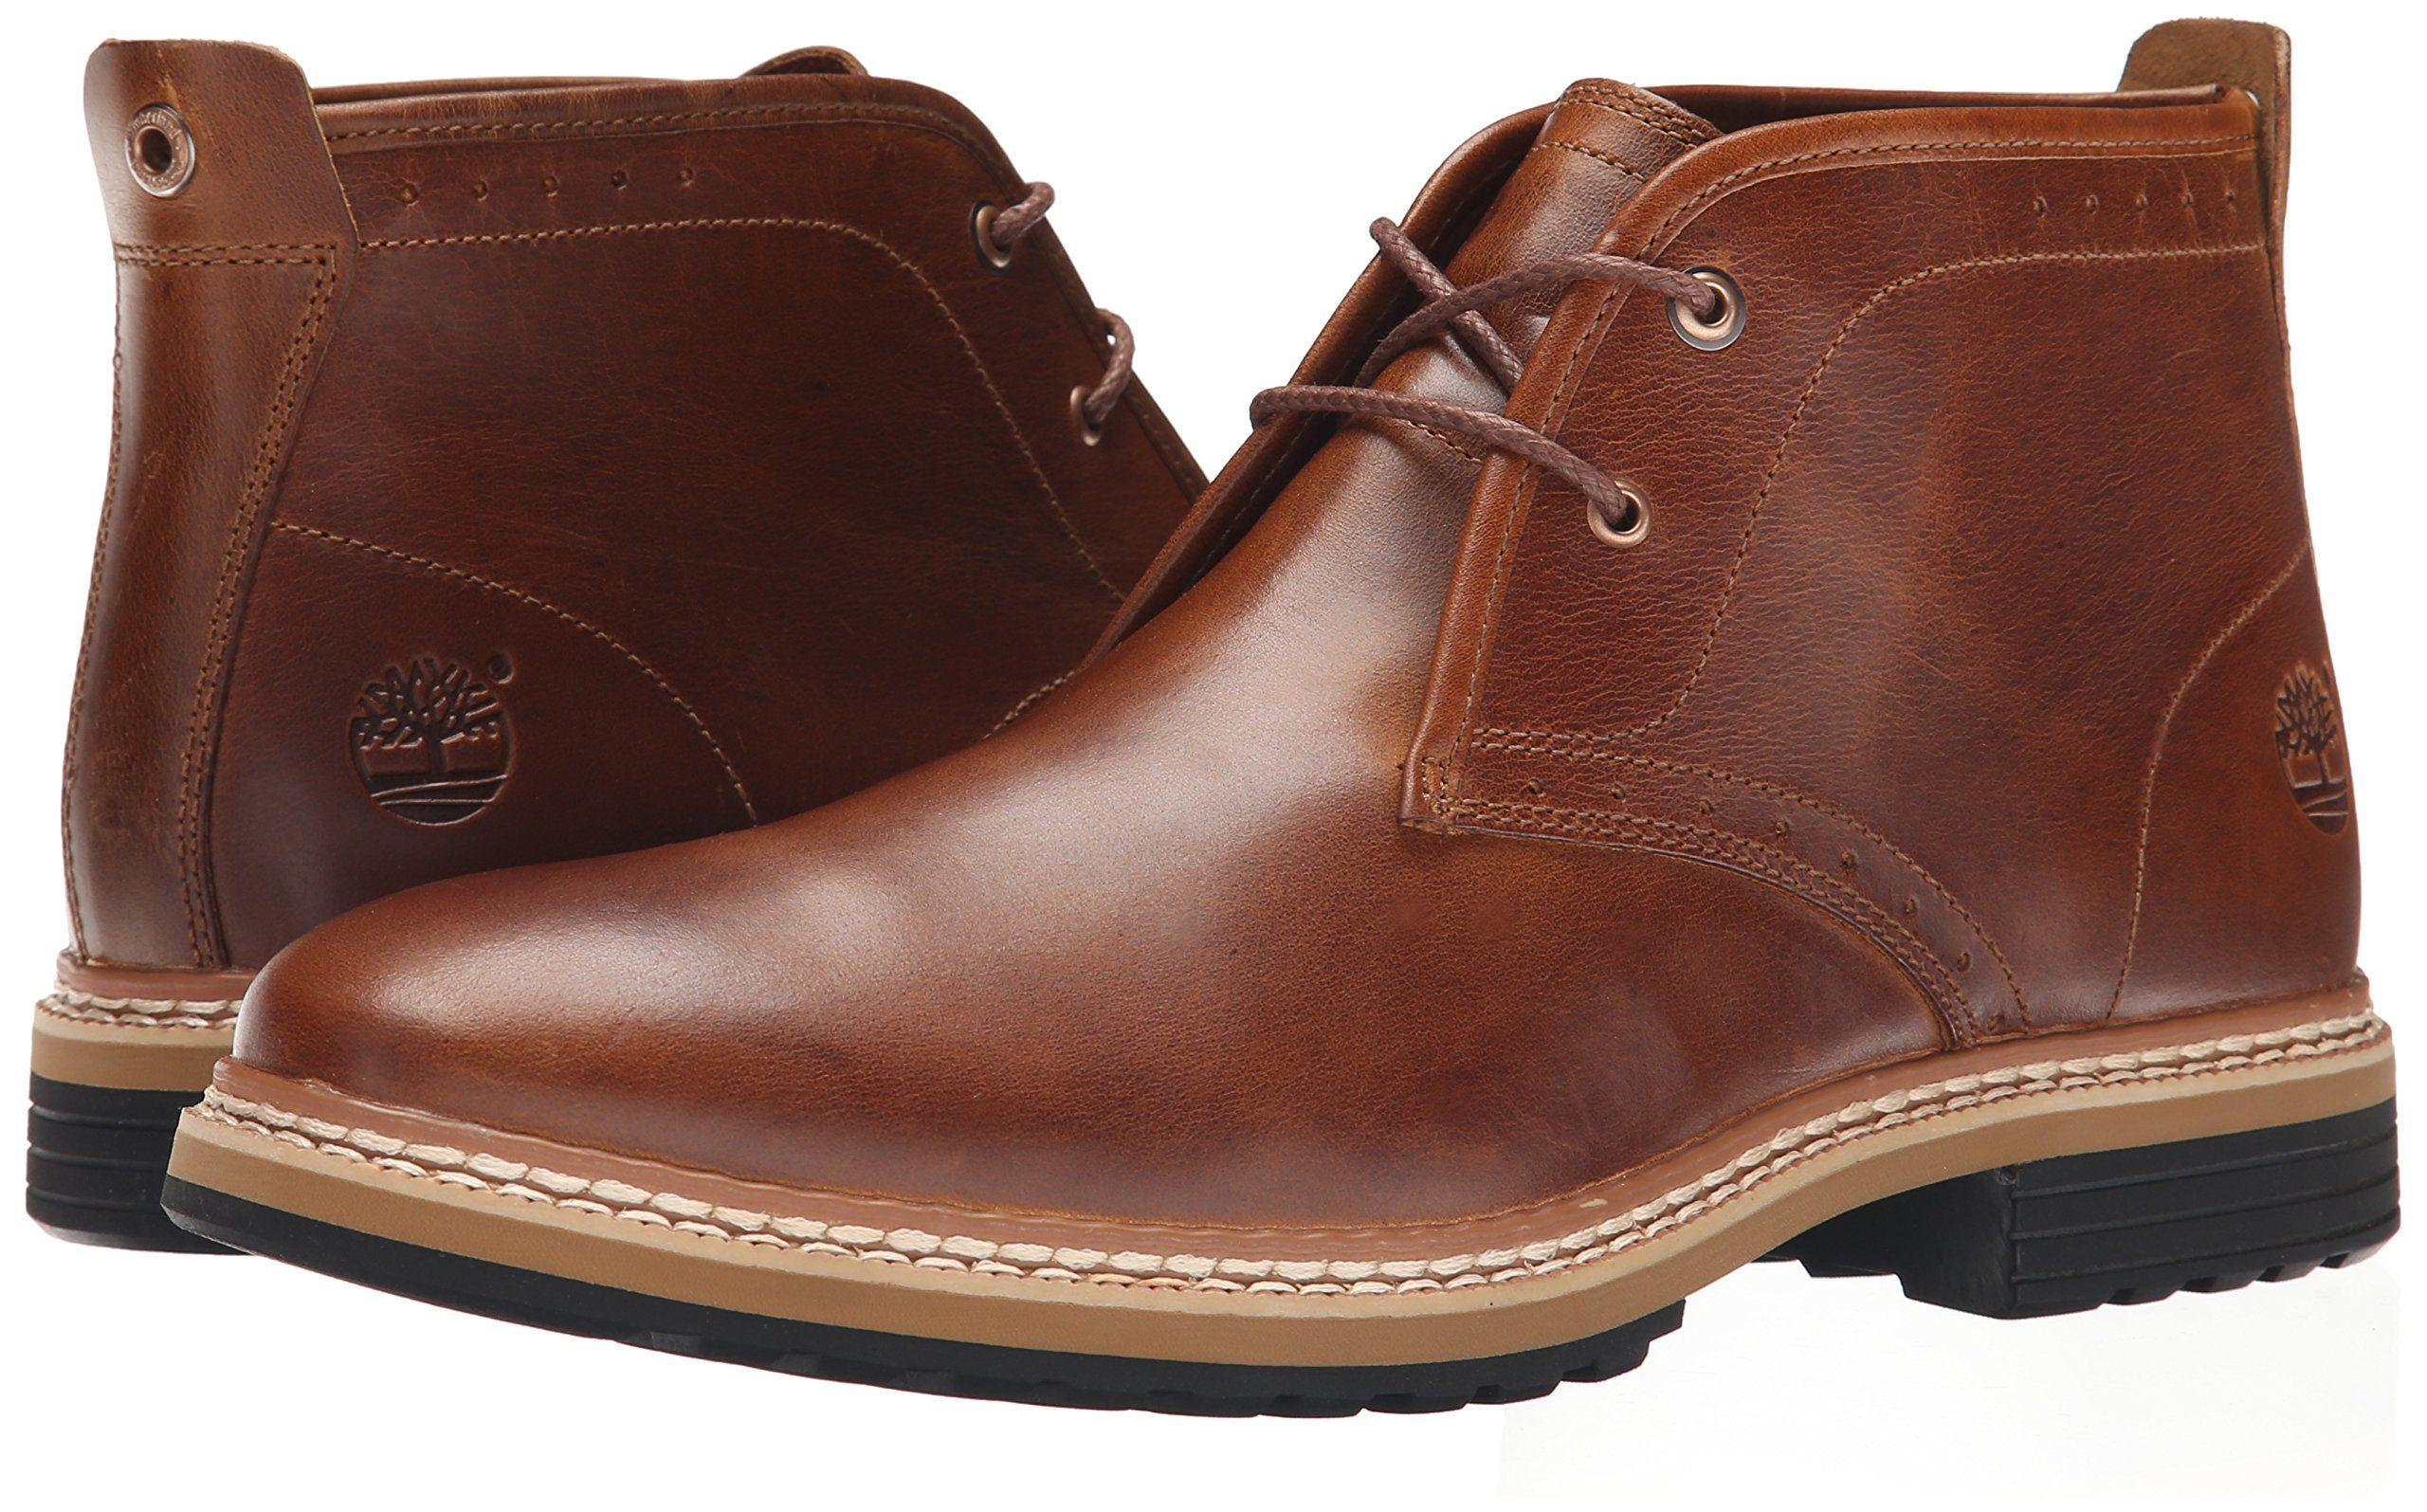 b754b006d7927 Amazon.com: Timberland Men's West Haven Plain Toe Chukka Boot ...